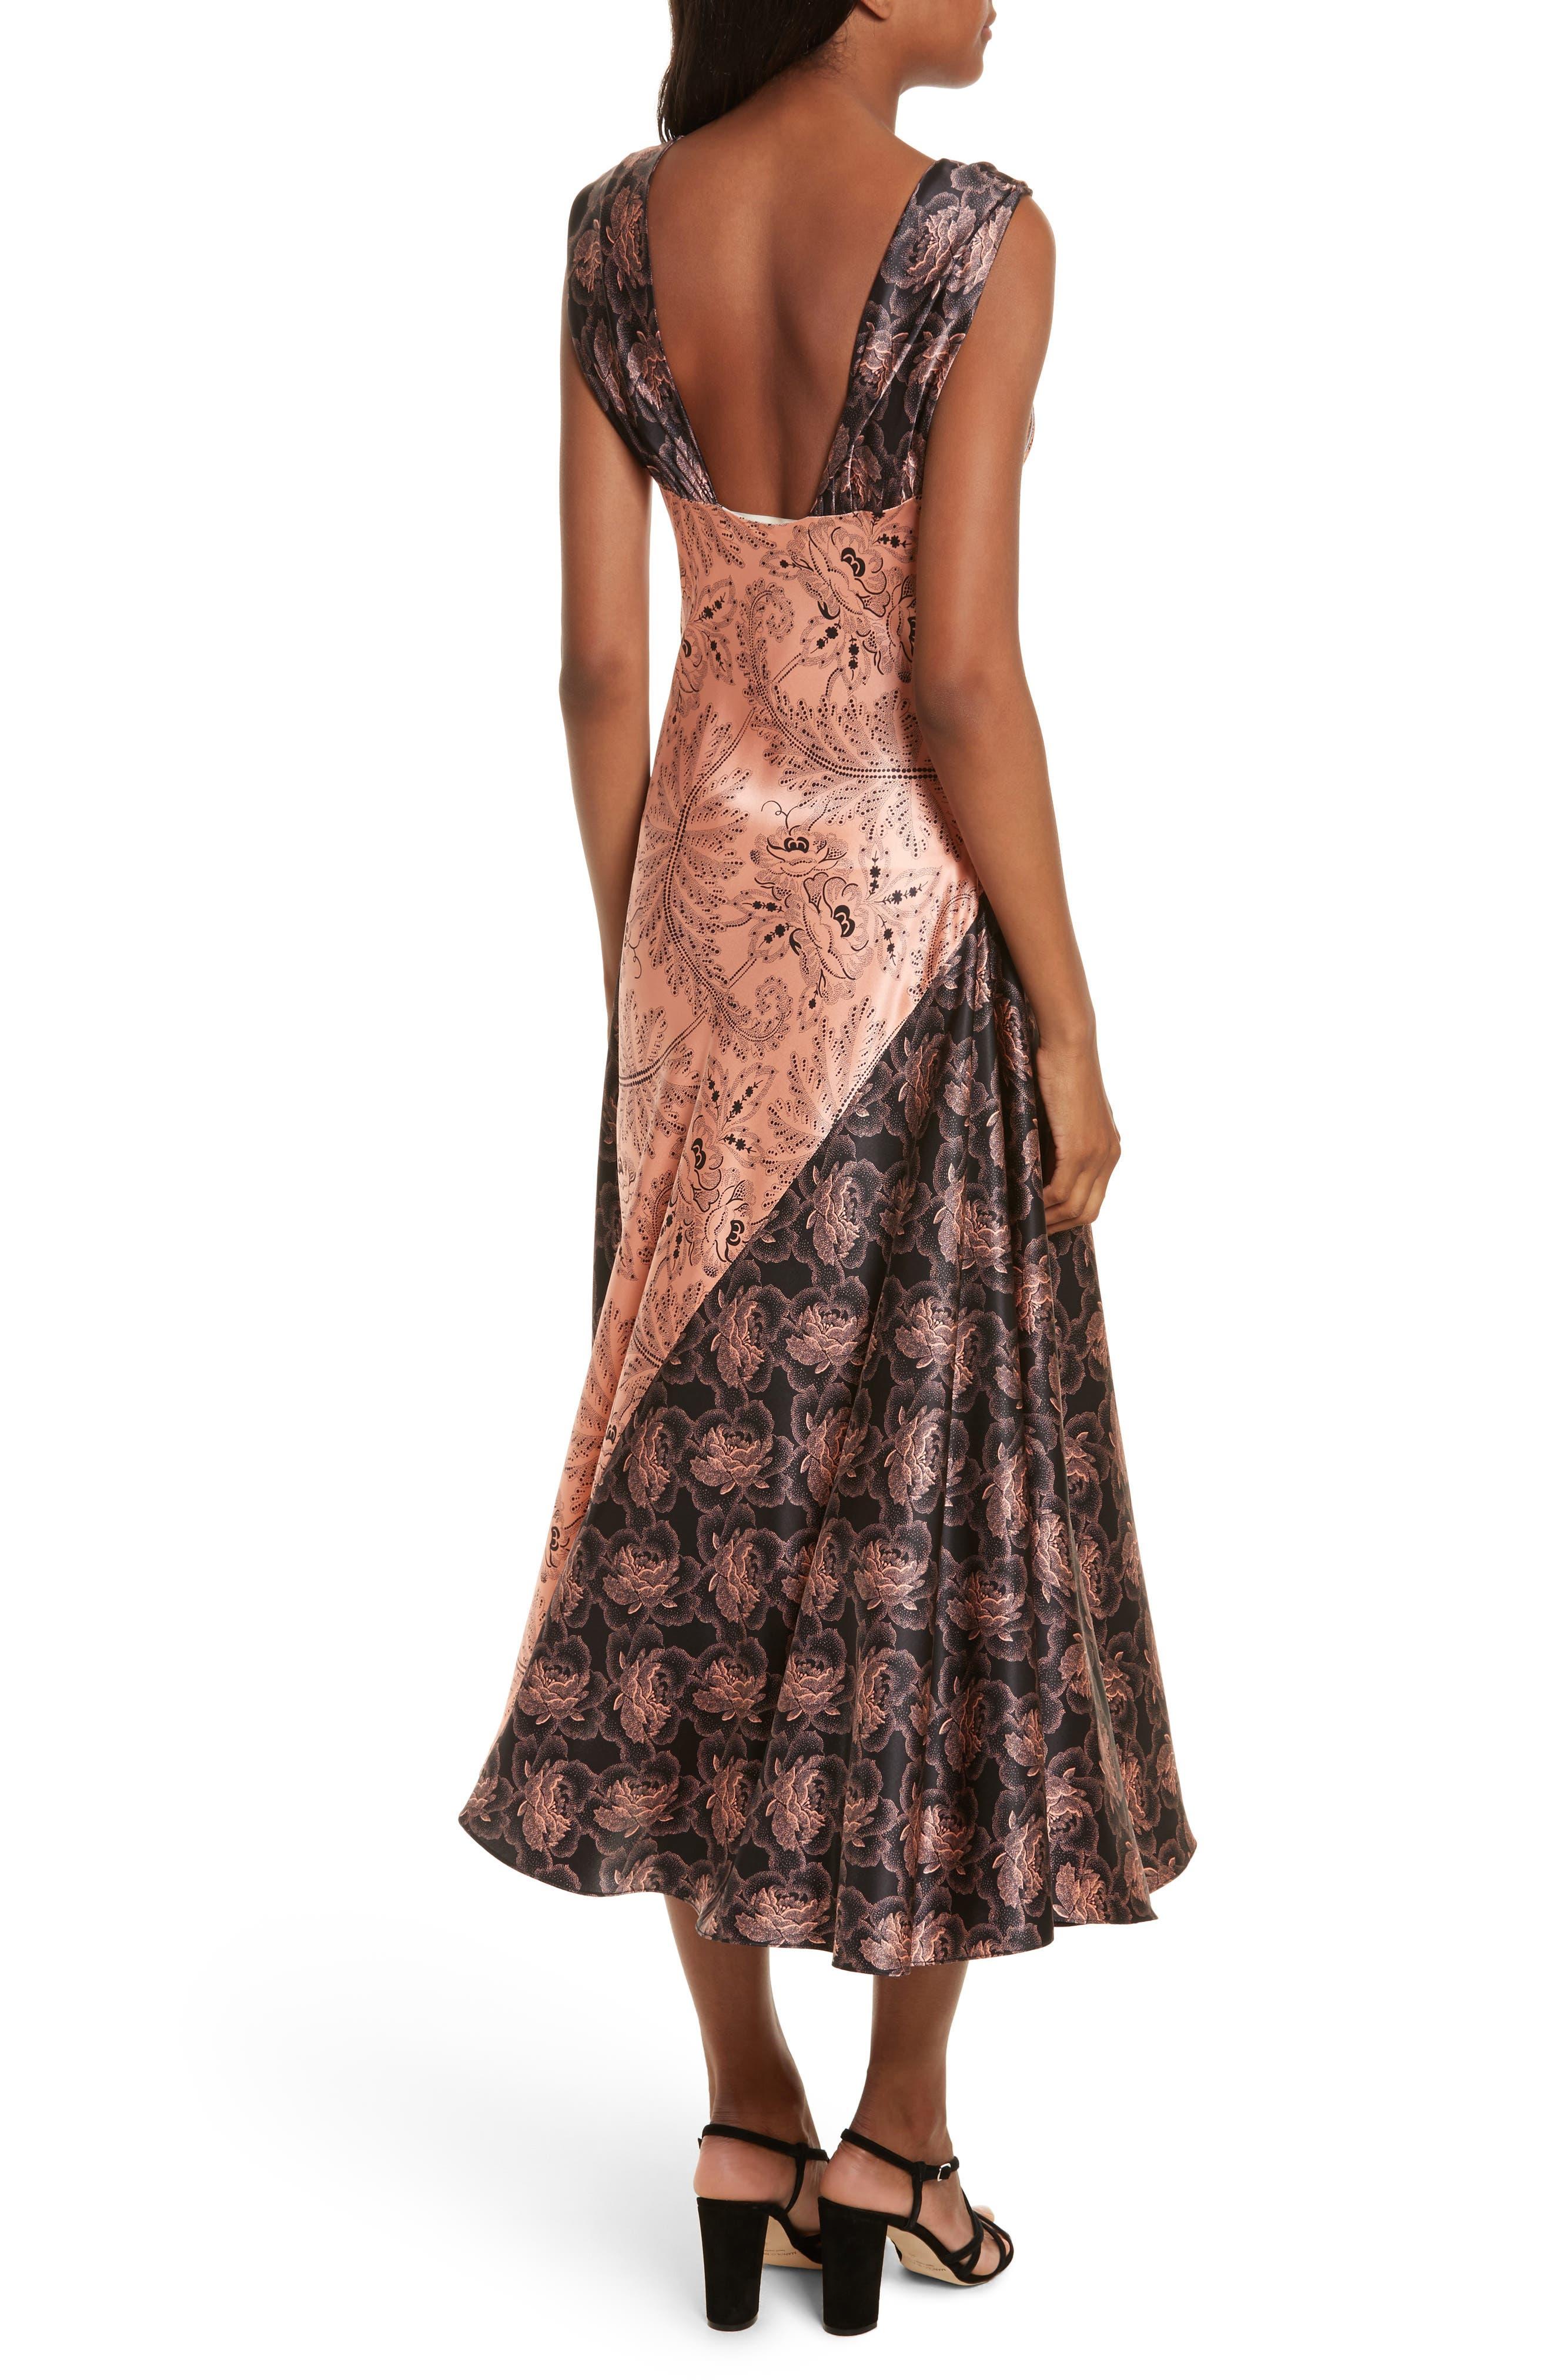 Diane von Furstenberg Draped Mixed Floral Midi Dress,                             Alternate thumbnail 2, color,                             654